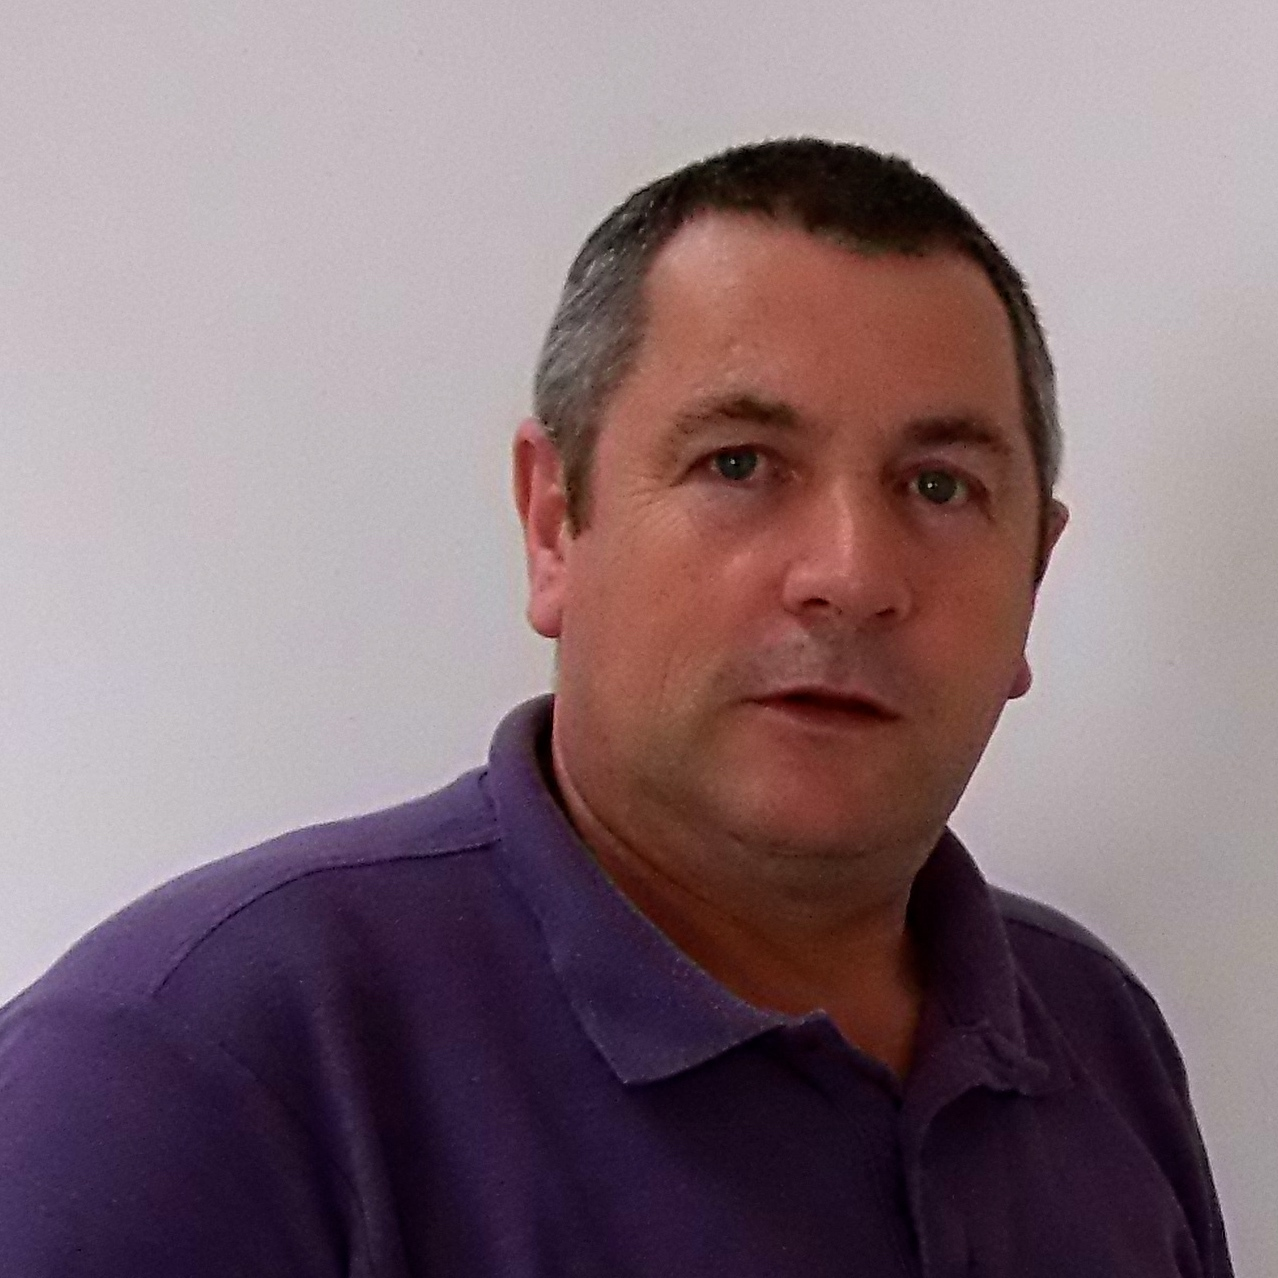 Daniel Mc Keon